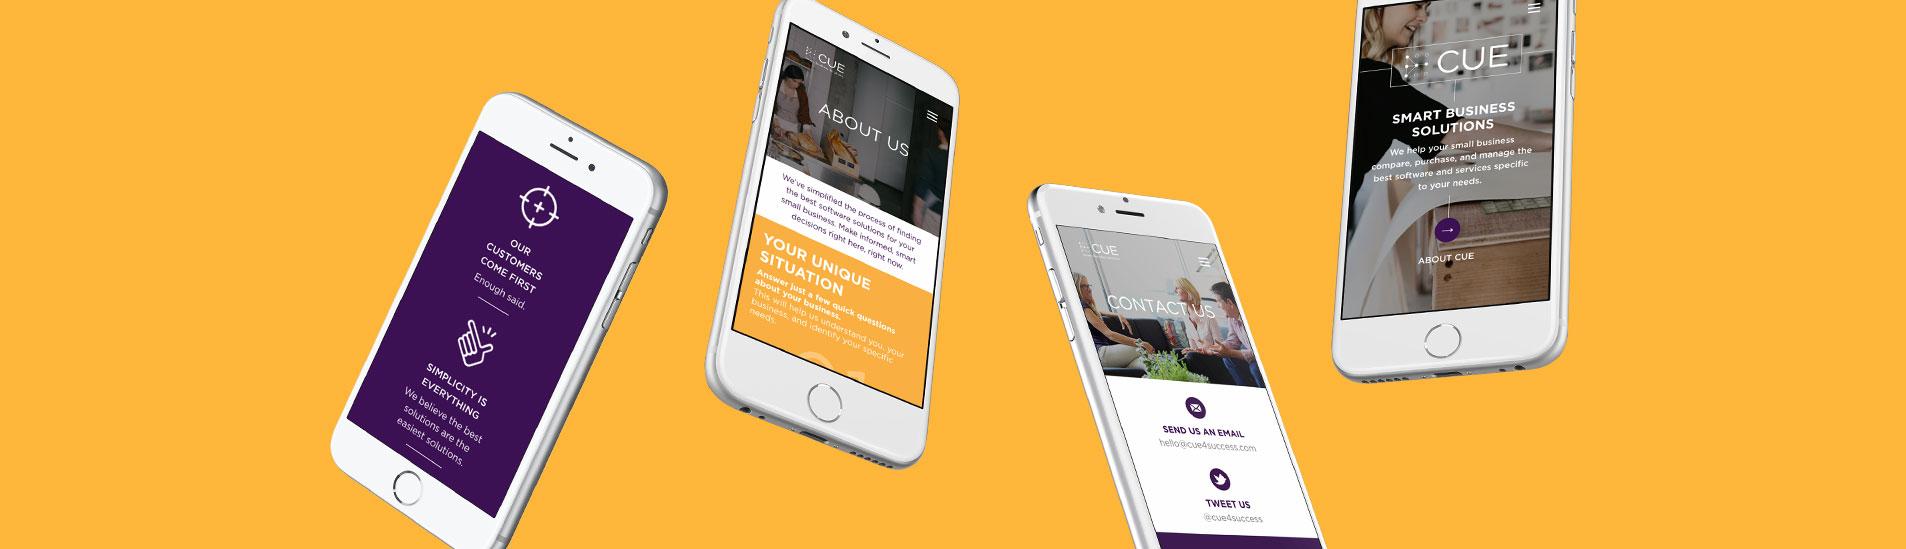 mobile web designs for cue